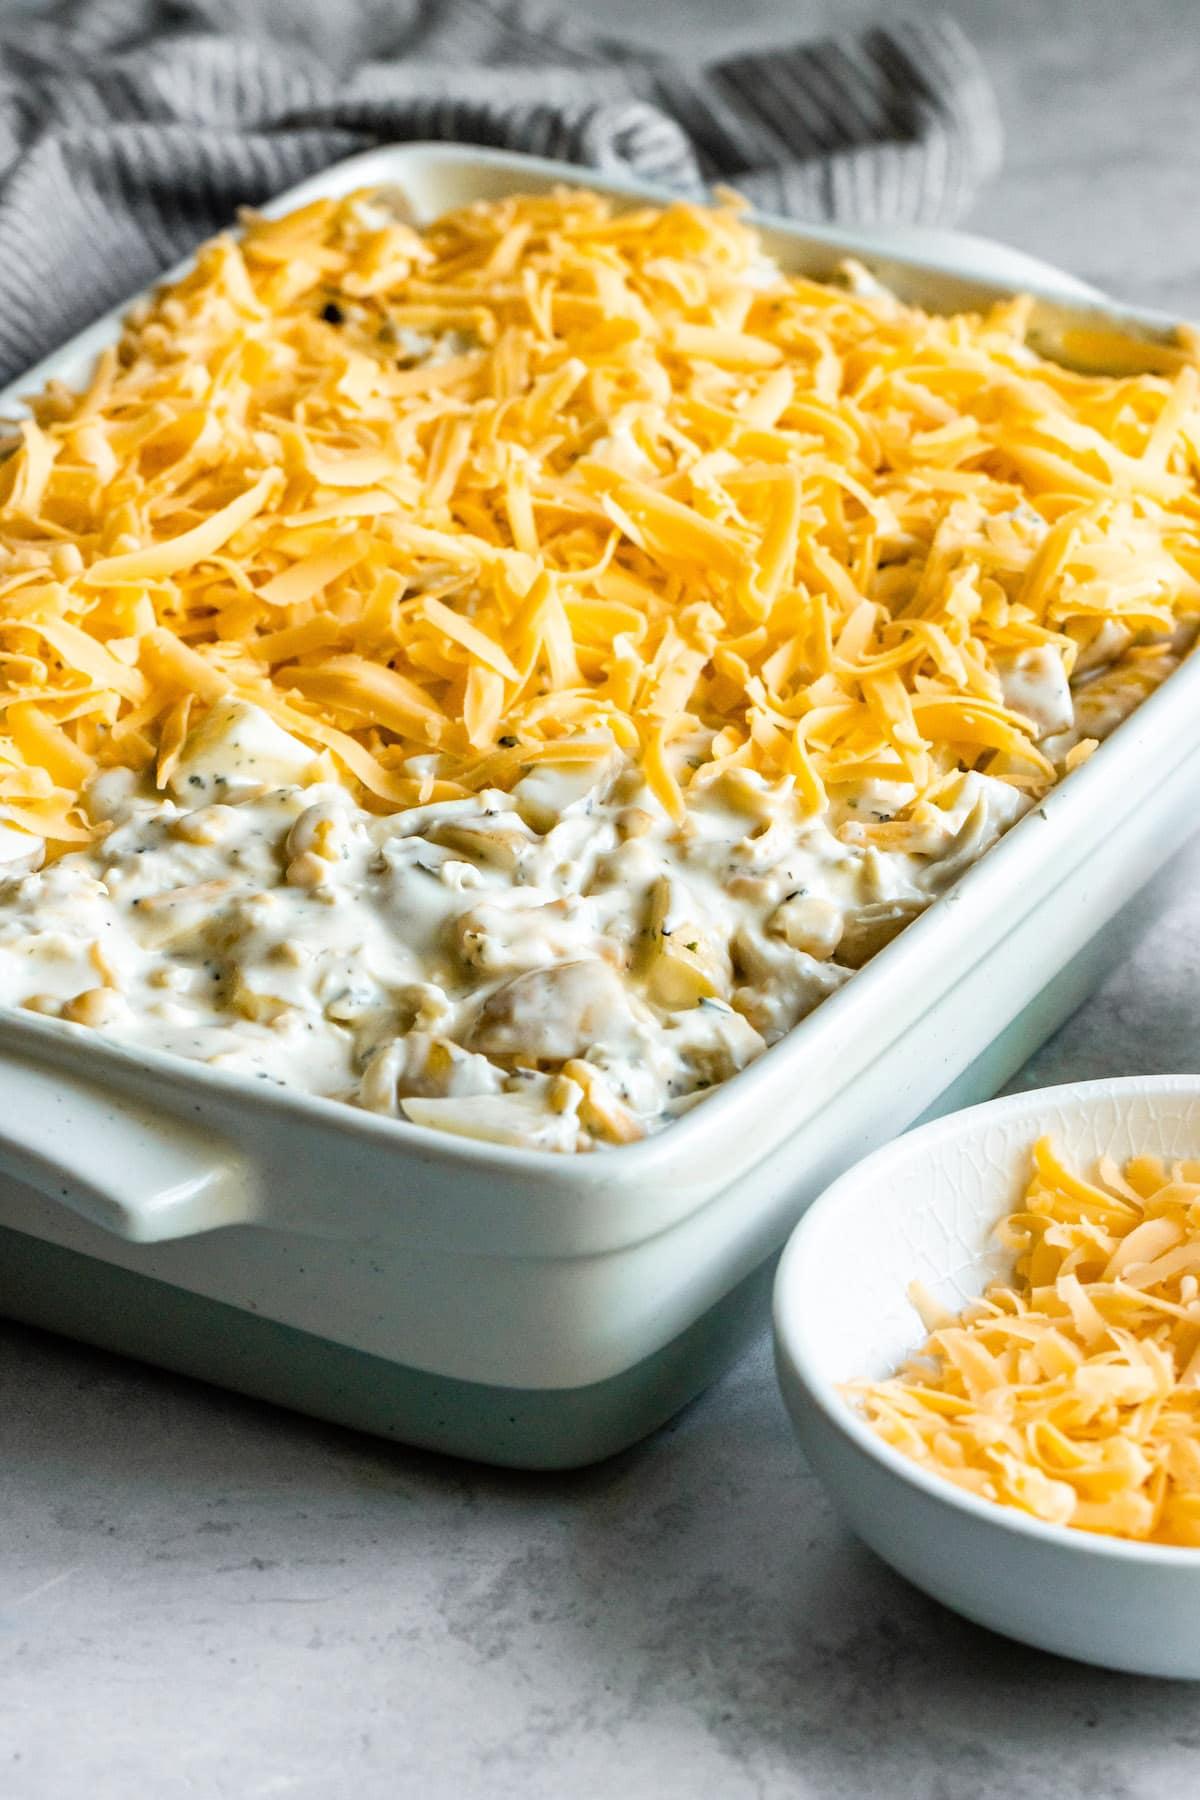 Cheesy hashbrown casserole with chicken.